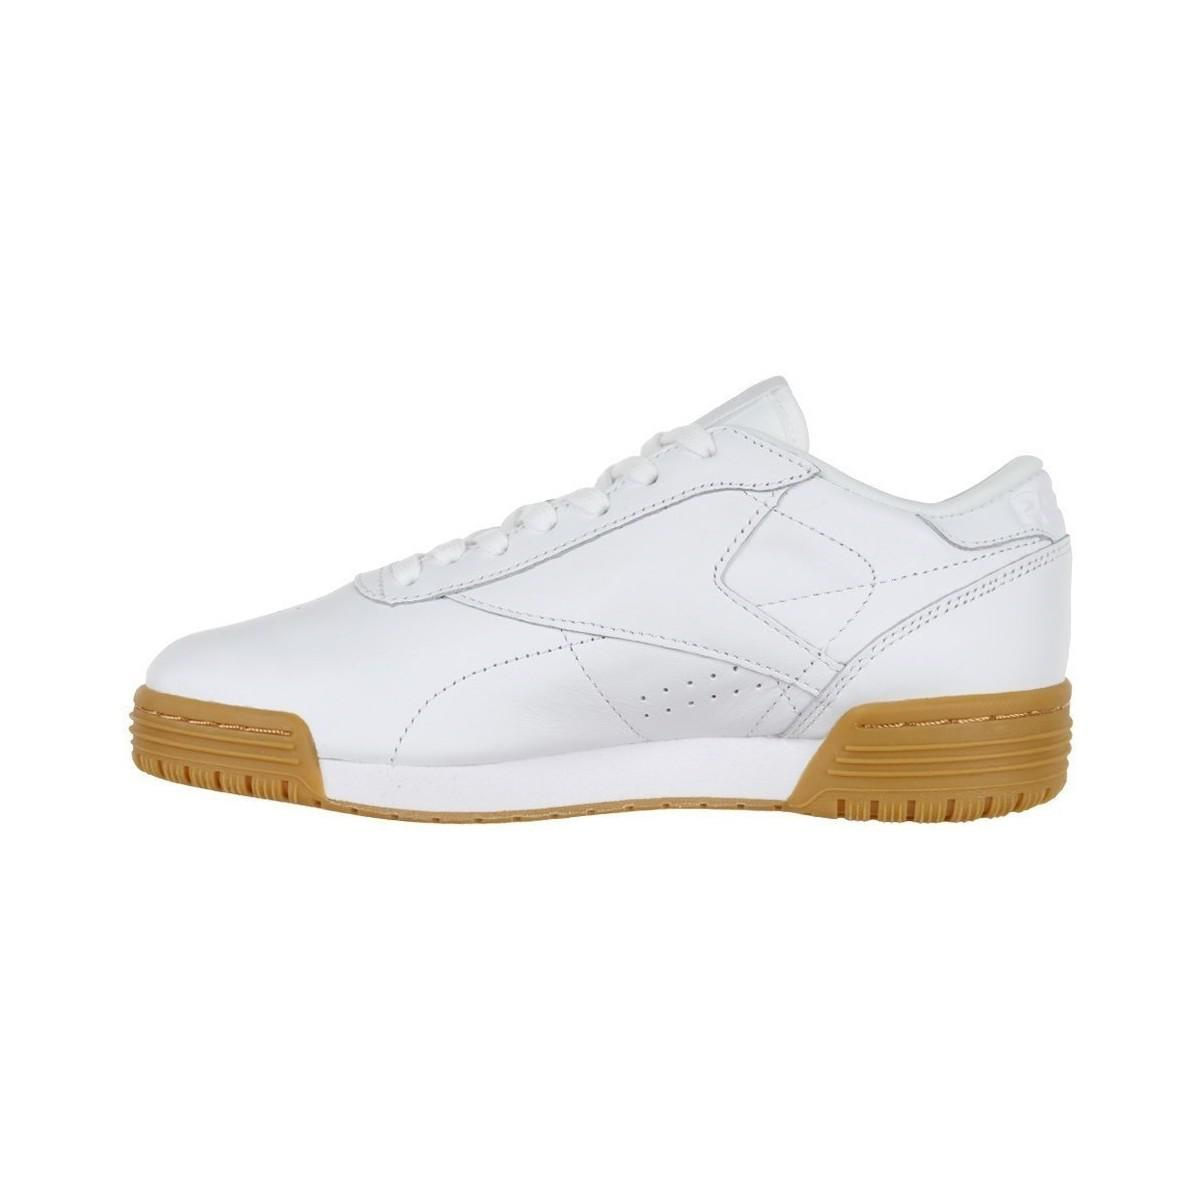 Reebok Sport Chaussures Exofit LO Cln Garment Reebok Sport vYNZMU